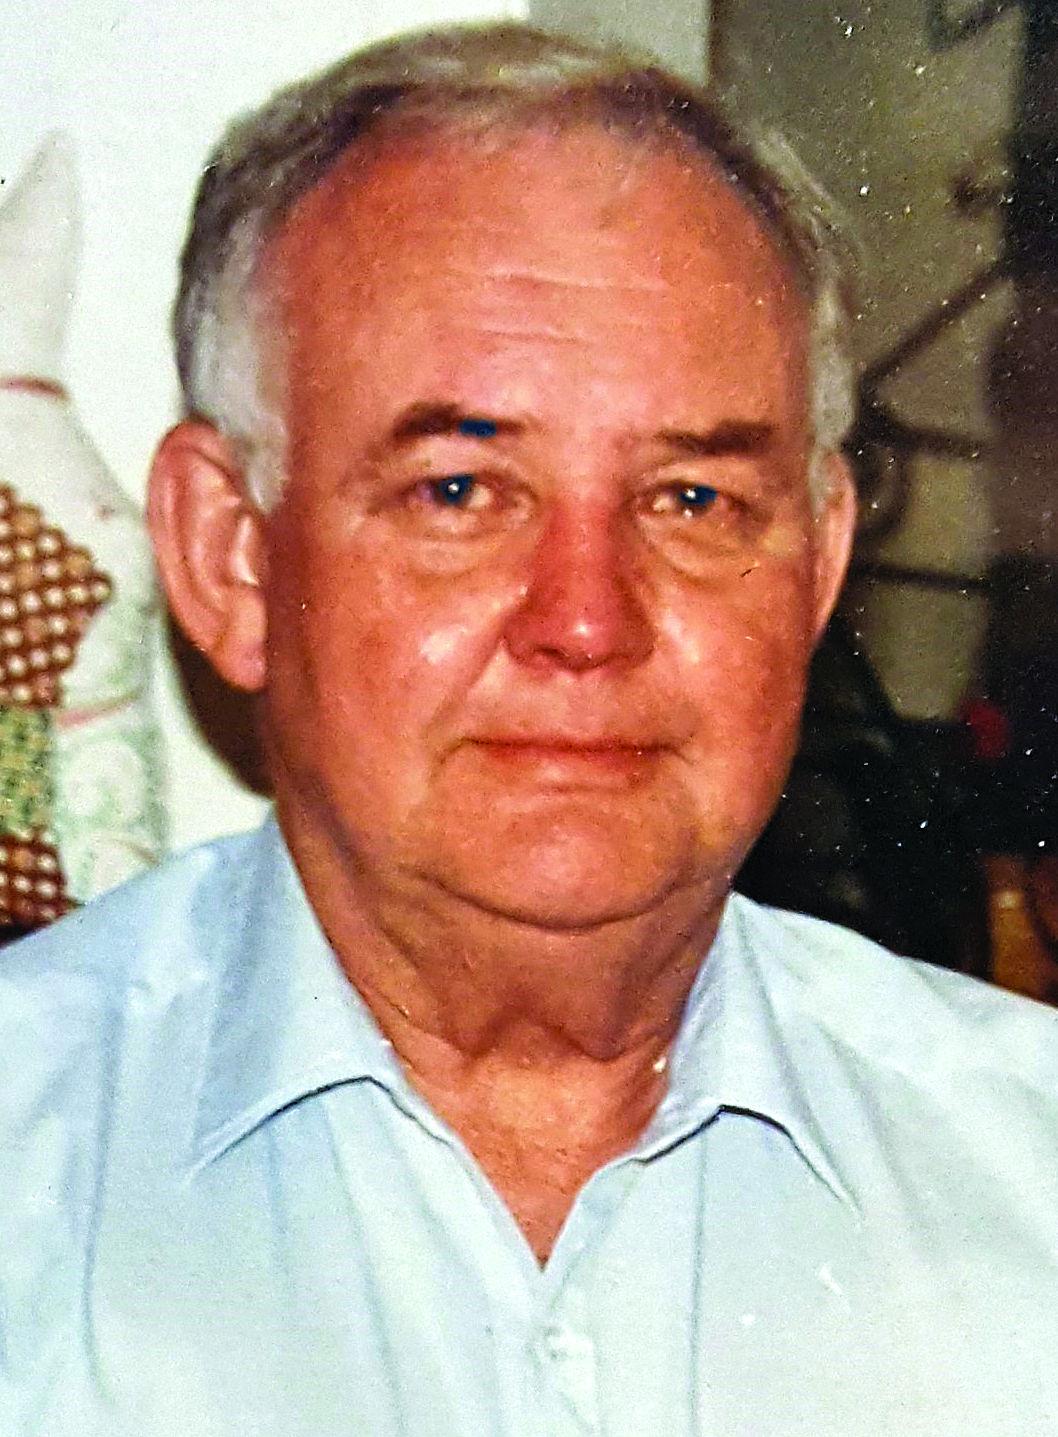 Johnson obituaries starlocalmedia john pawpaw johnson age 80 of lewisville passed away sunday april 2 2016 in flower mound izmirmasajfo